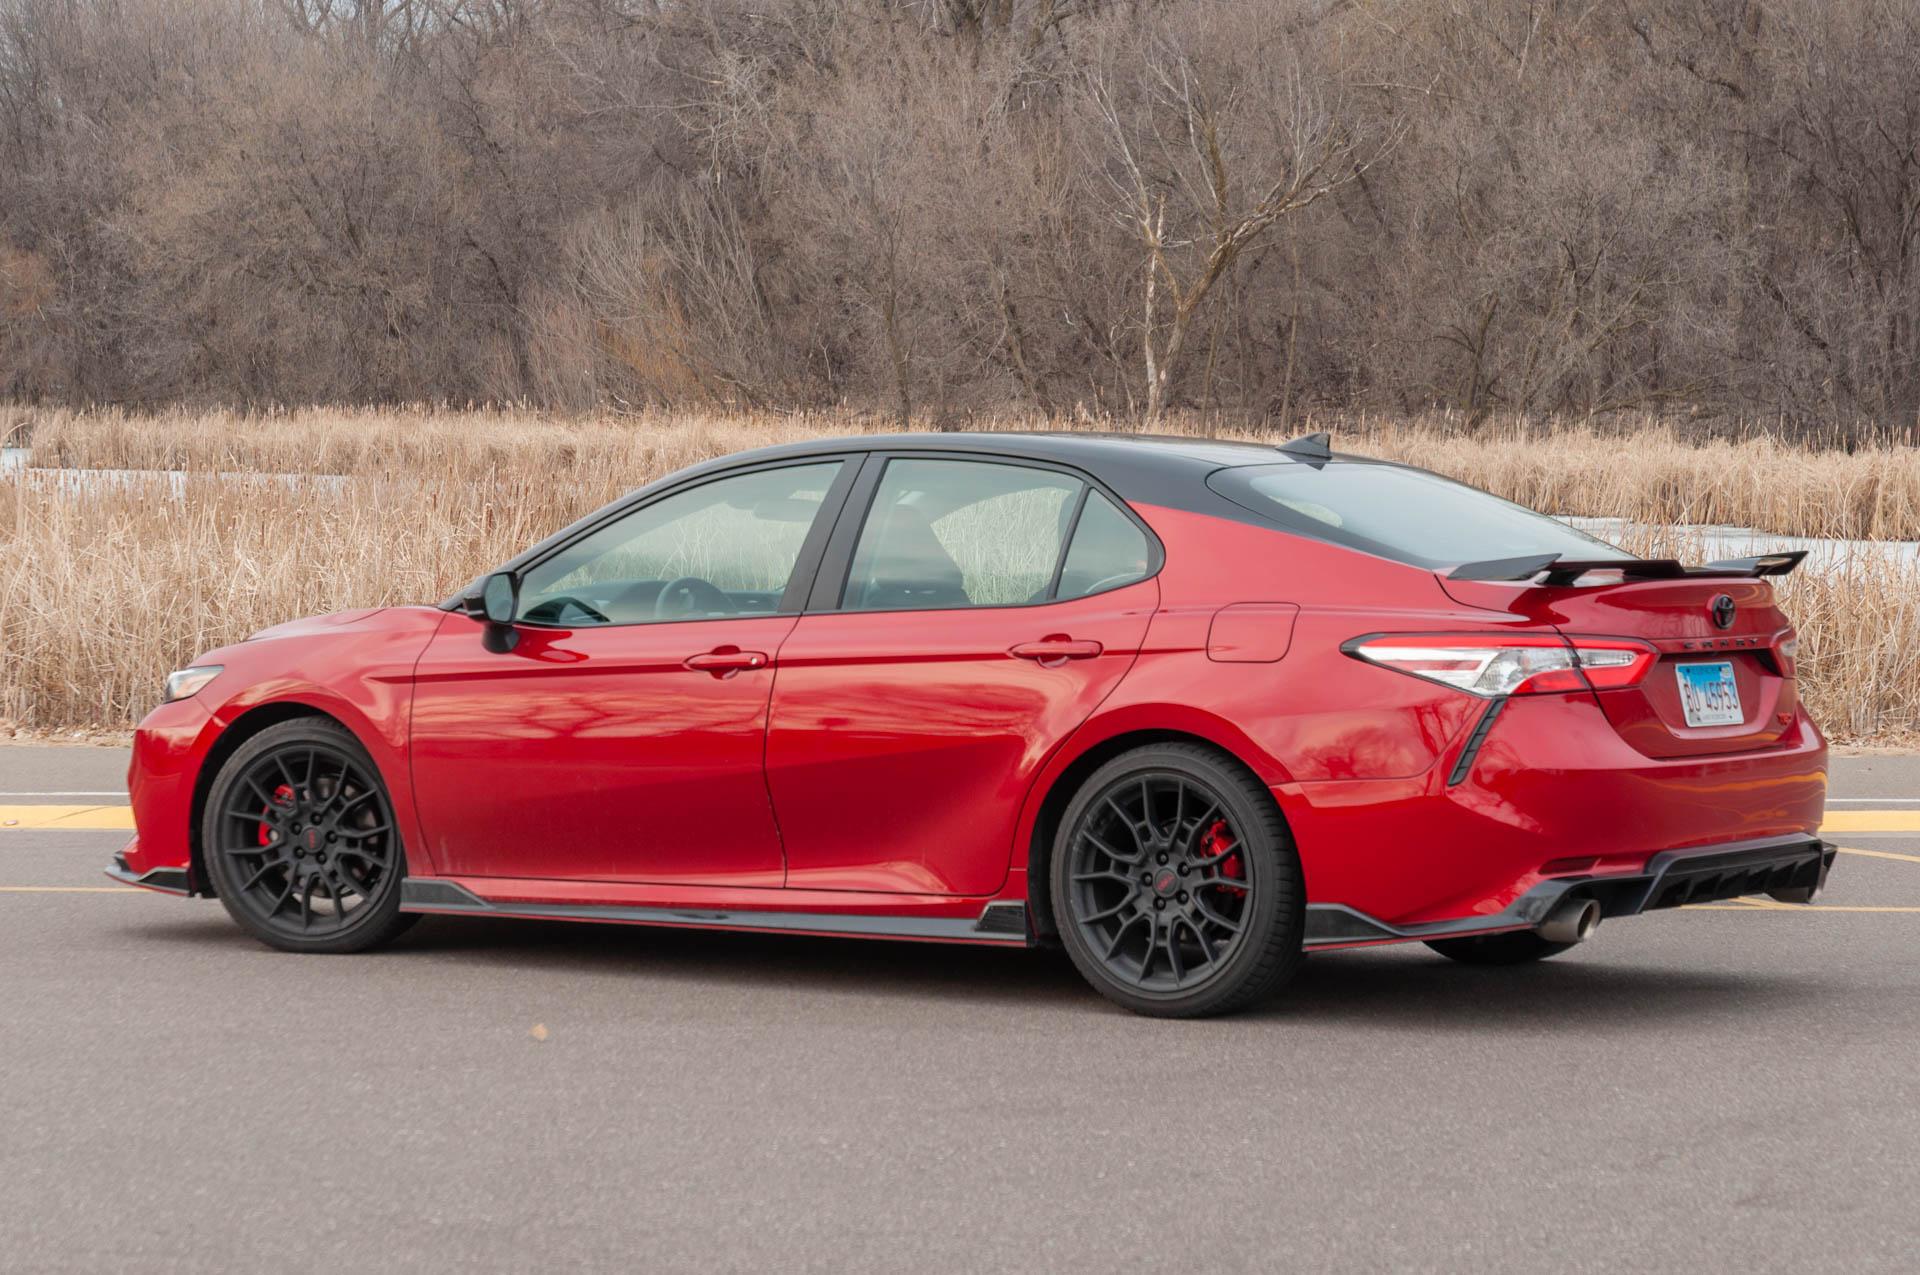 Kekurangan Toyota Bmw Harga